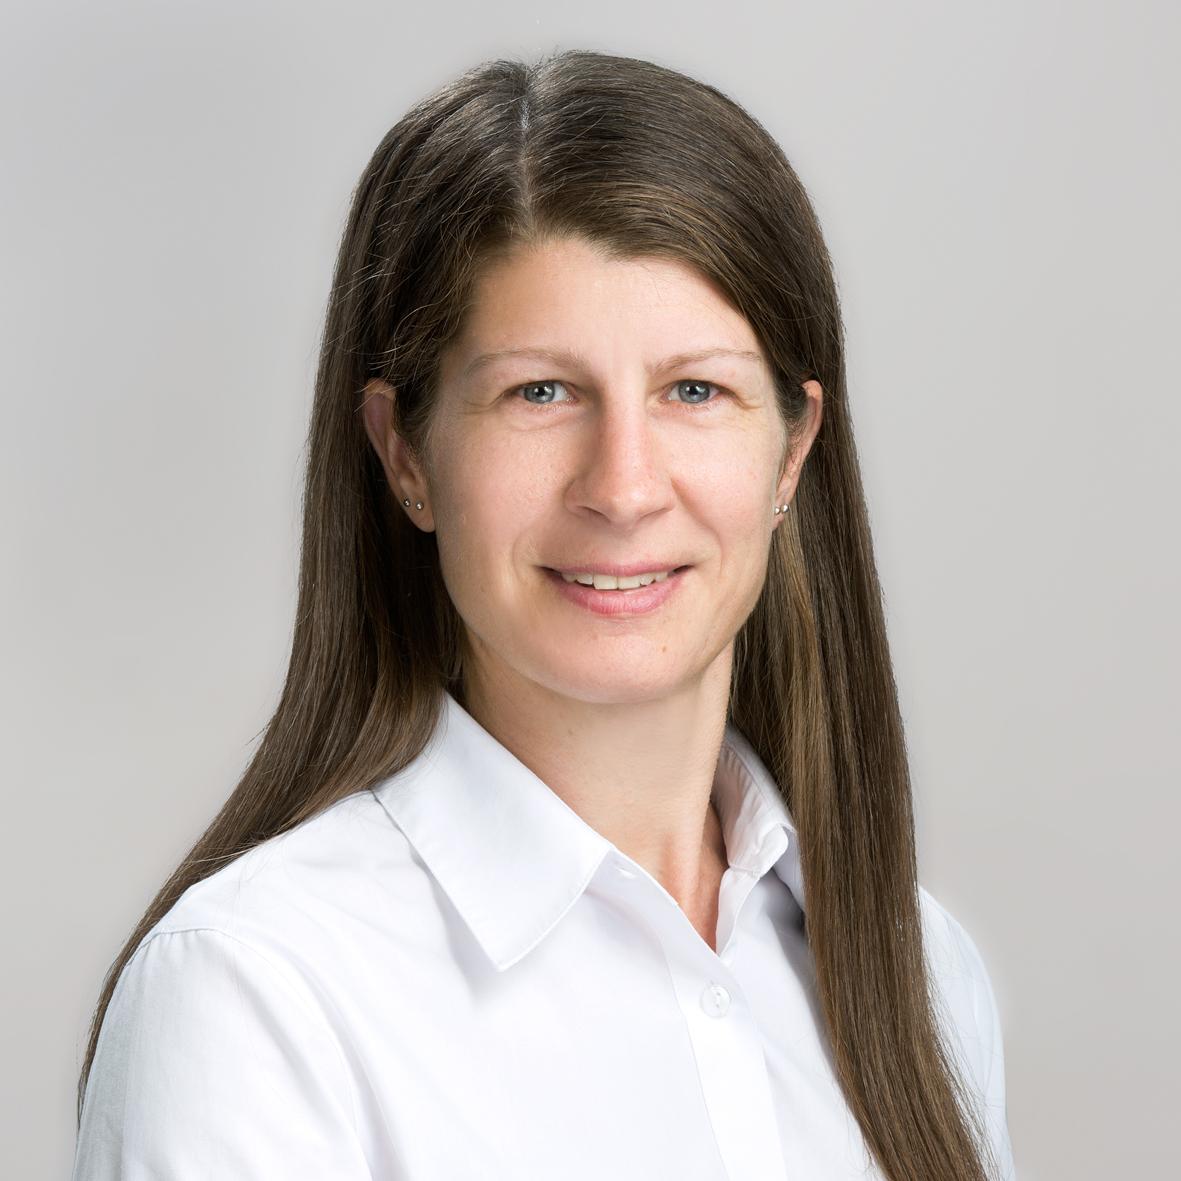 Theresa Lentsch